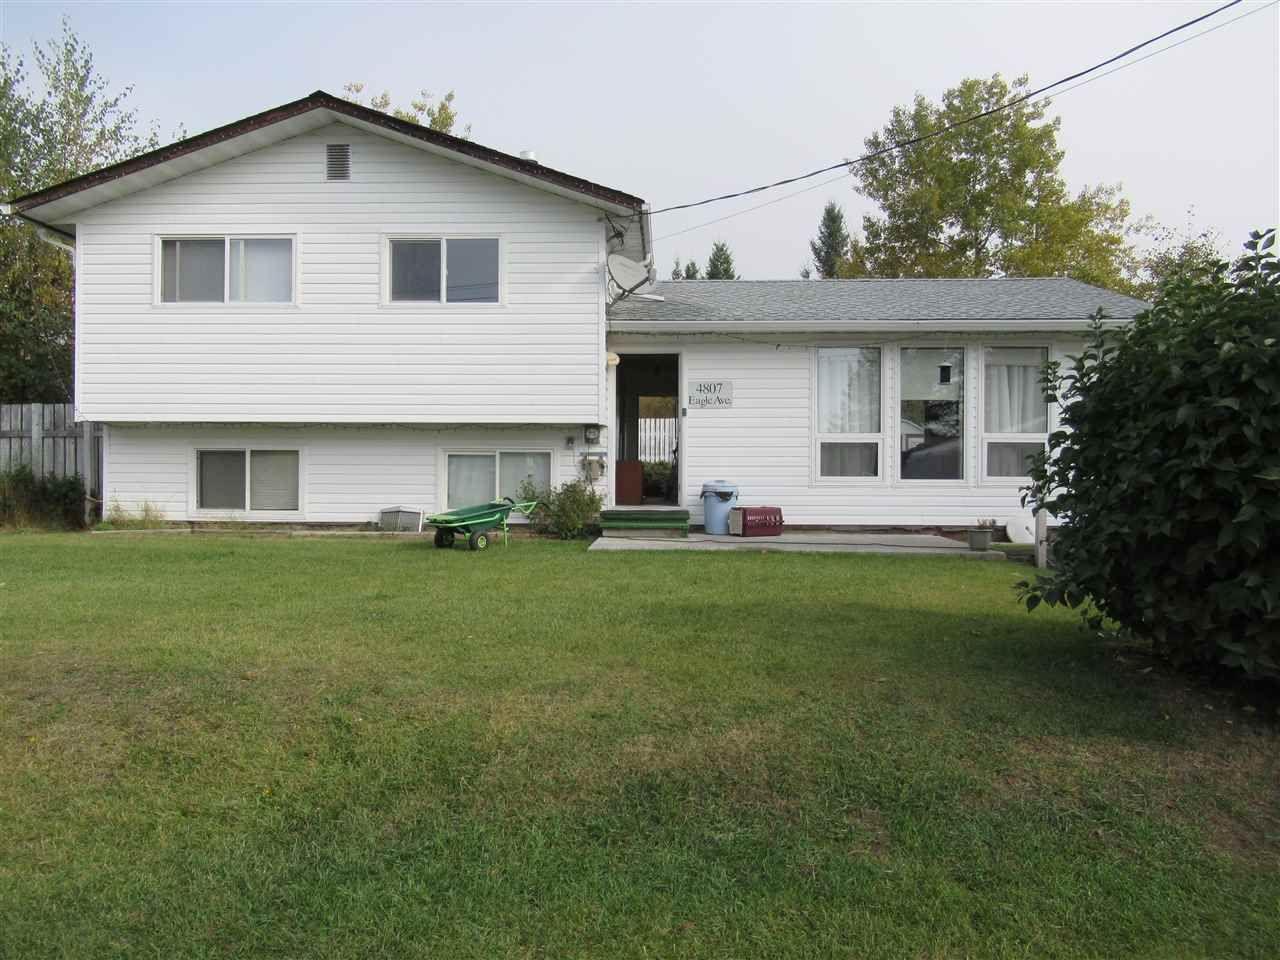 Main Photo: 4807 EAGLE Avenue: Lac la Hache House for sale (100 Mile House (Zone 10))  : MLS®# R2508510